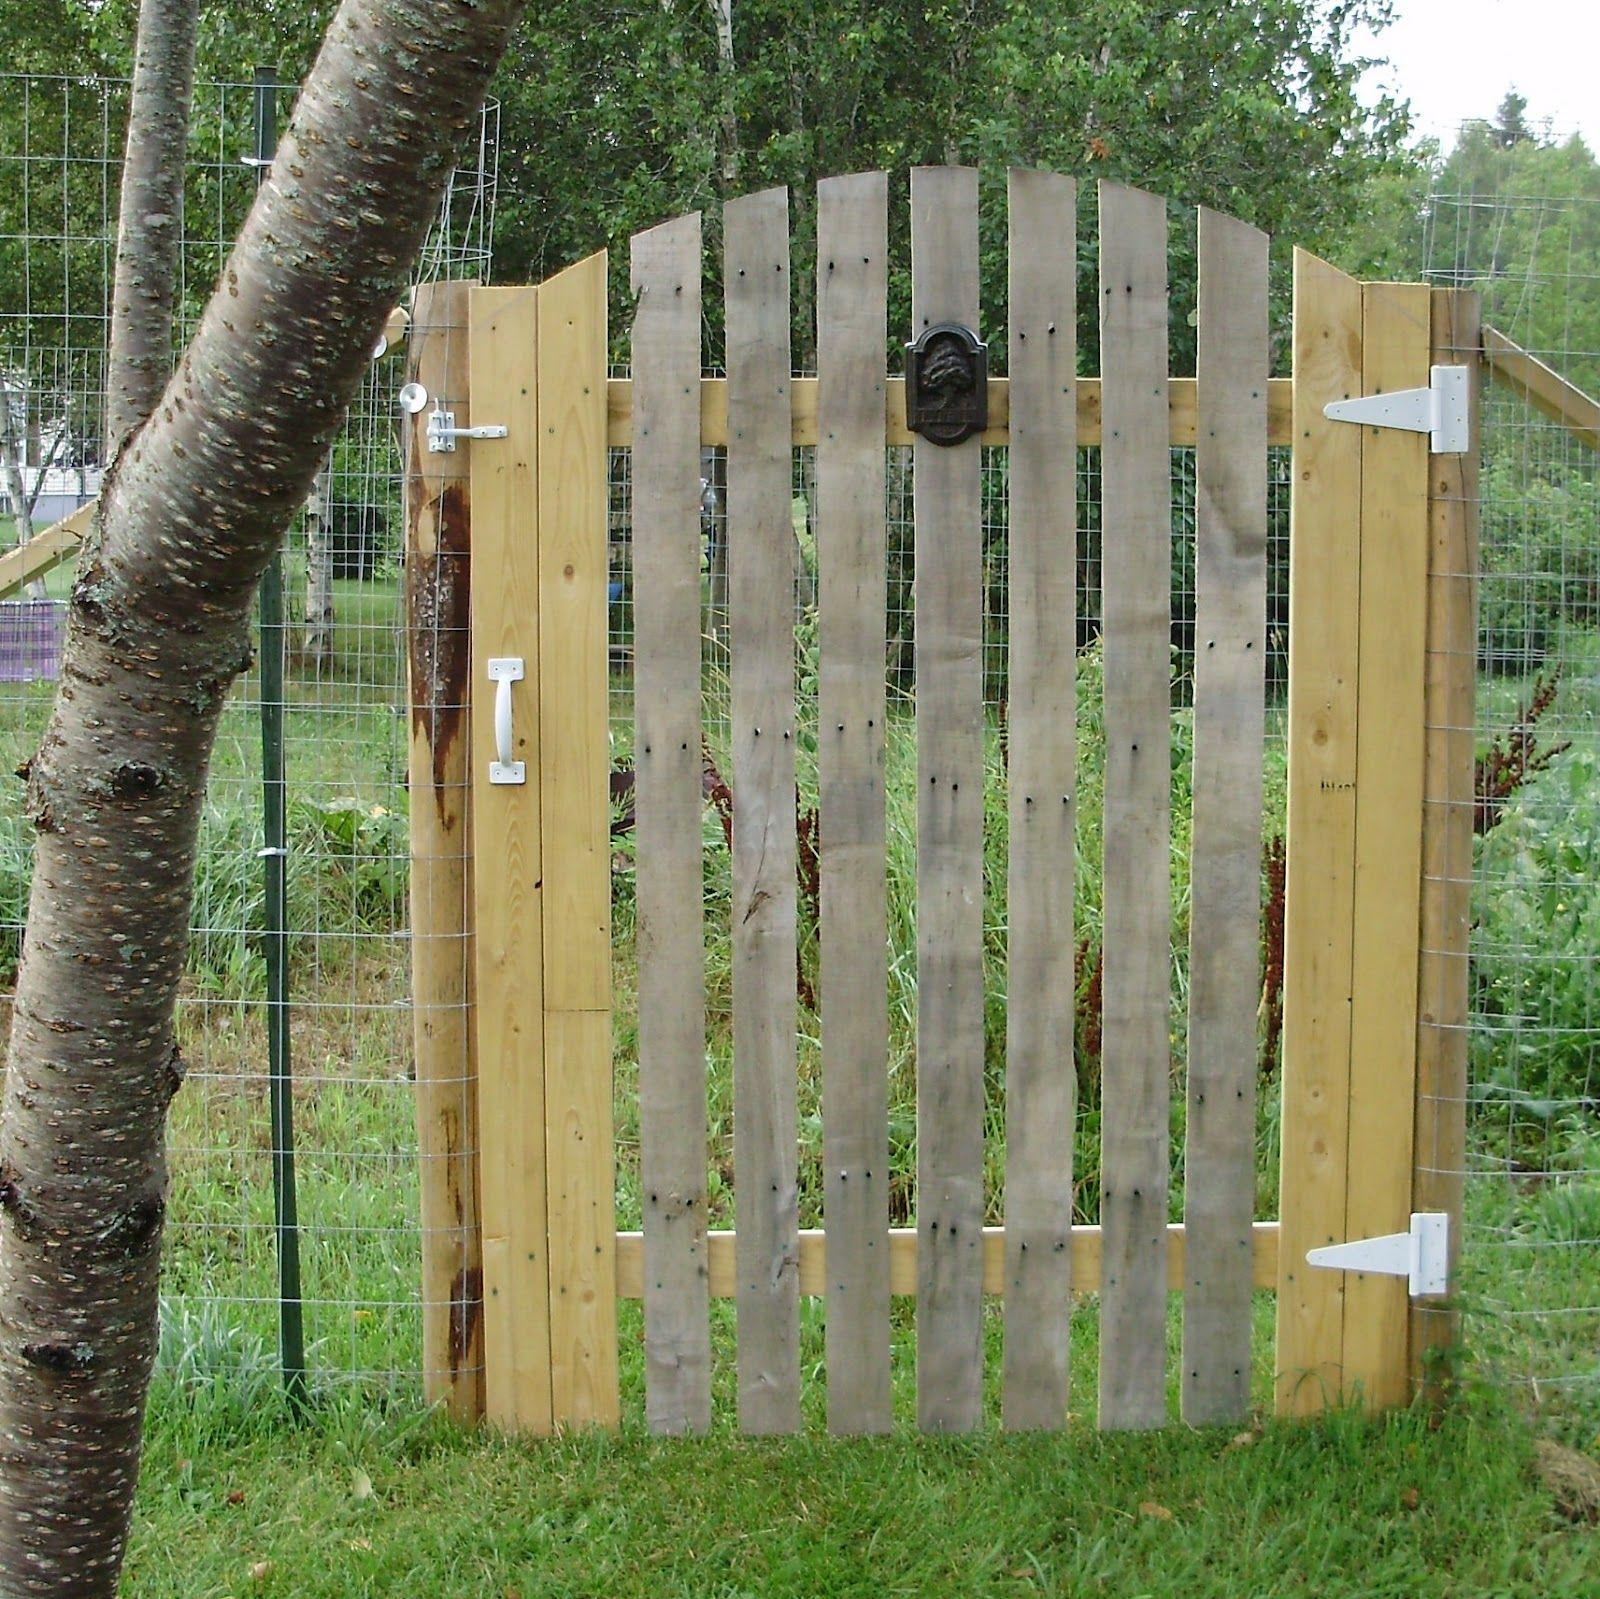 pallet gate cheap chicken coop ideas pinterest. Black Bedroom Furniture Sets. Home Design Ideas